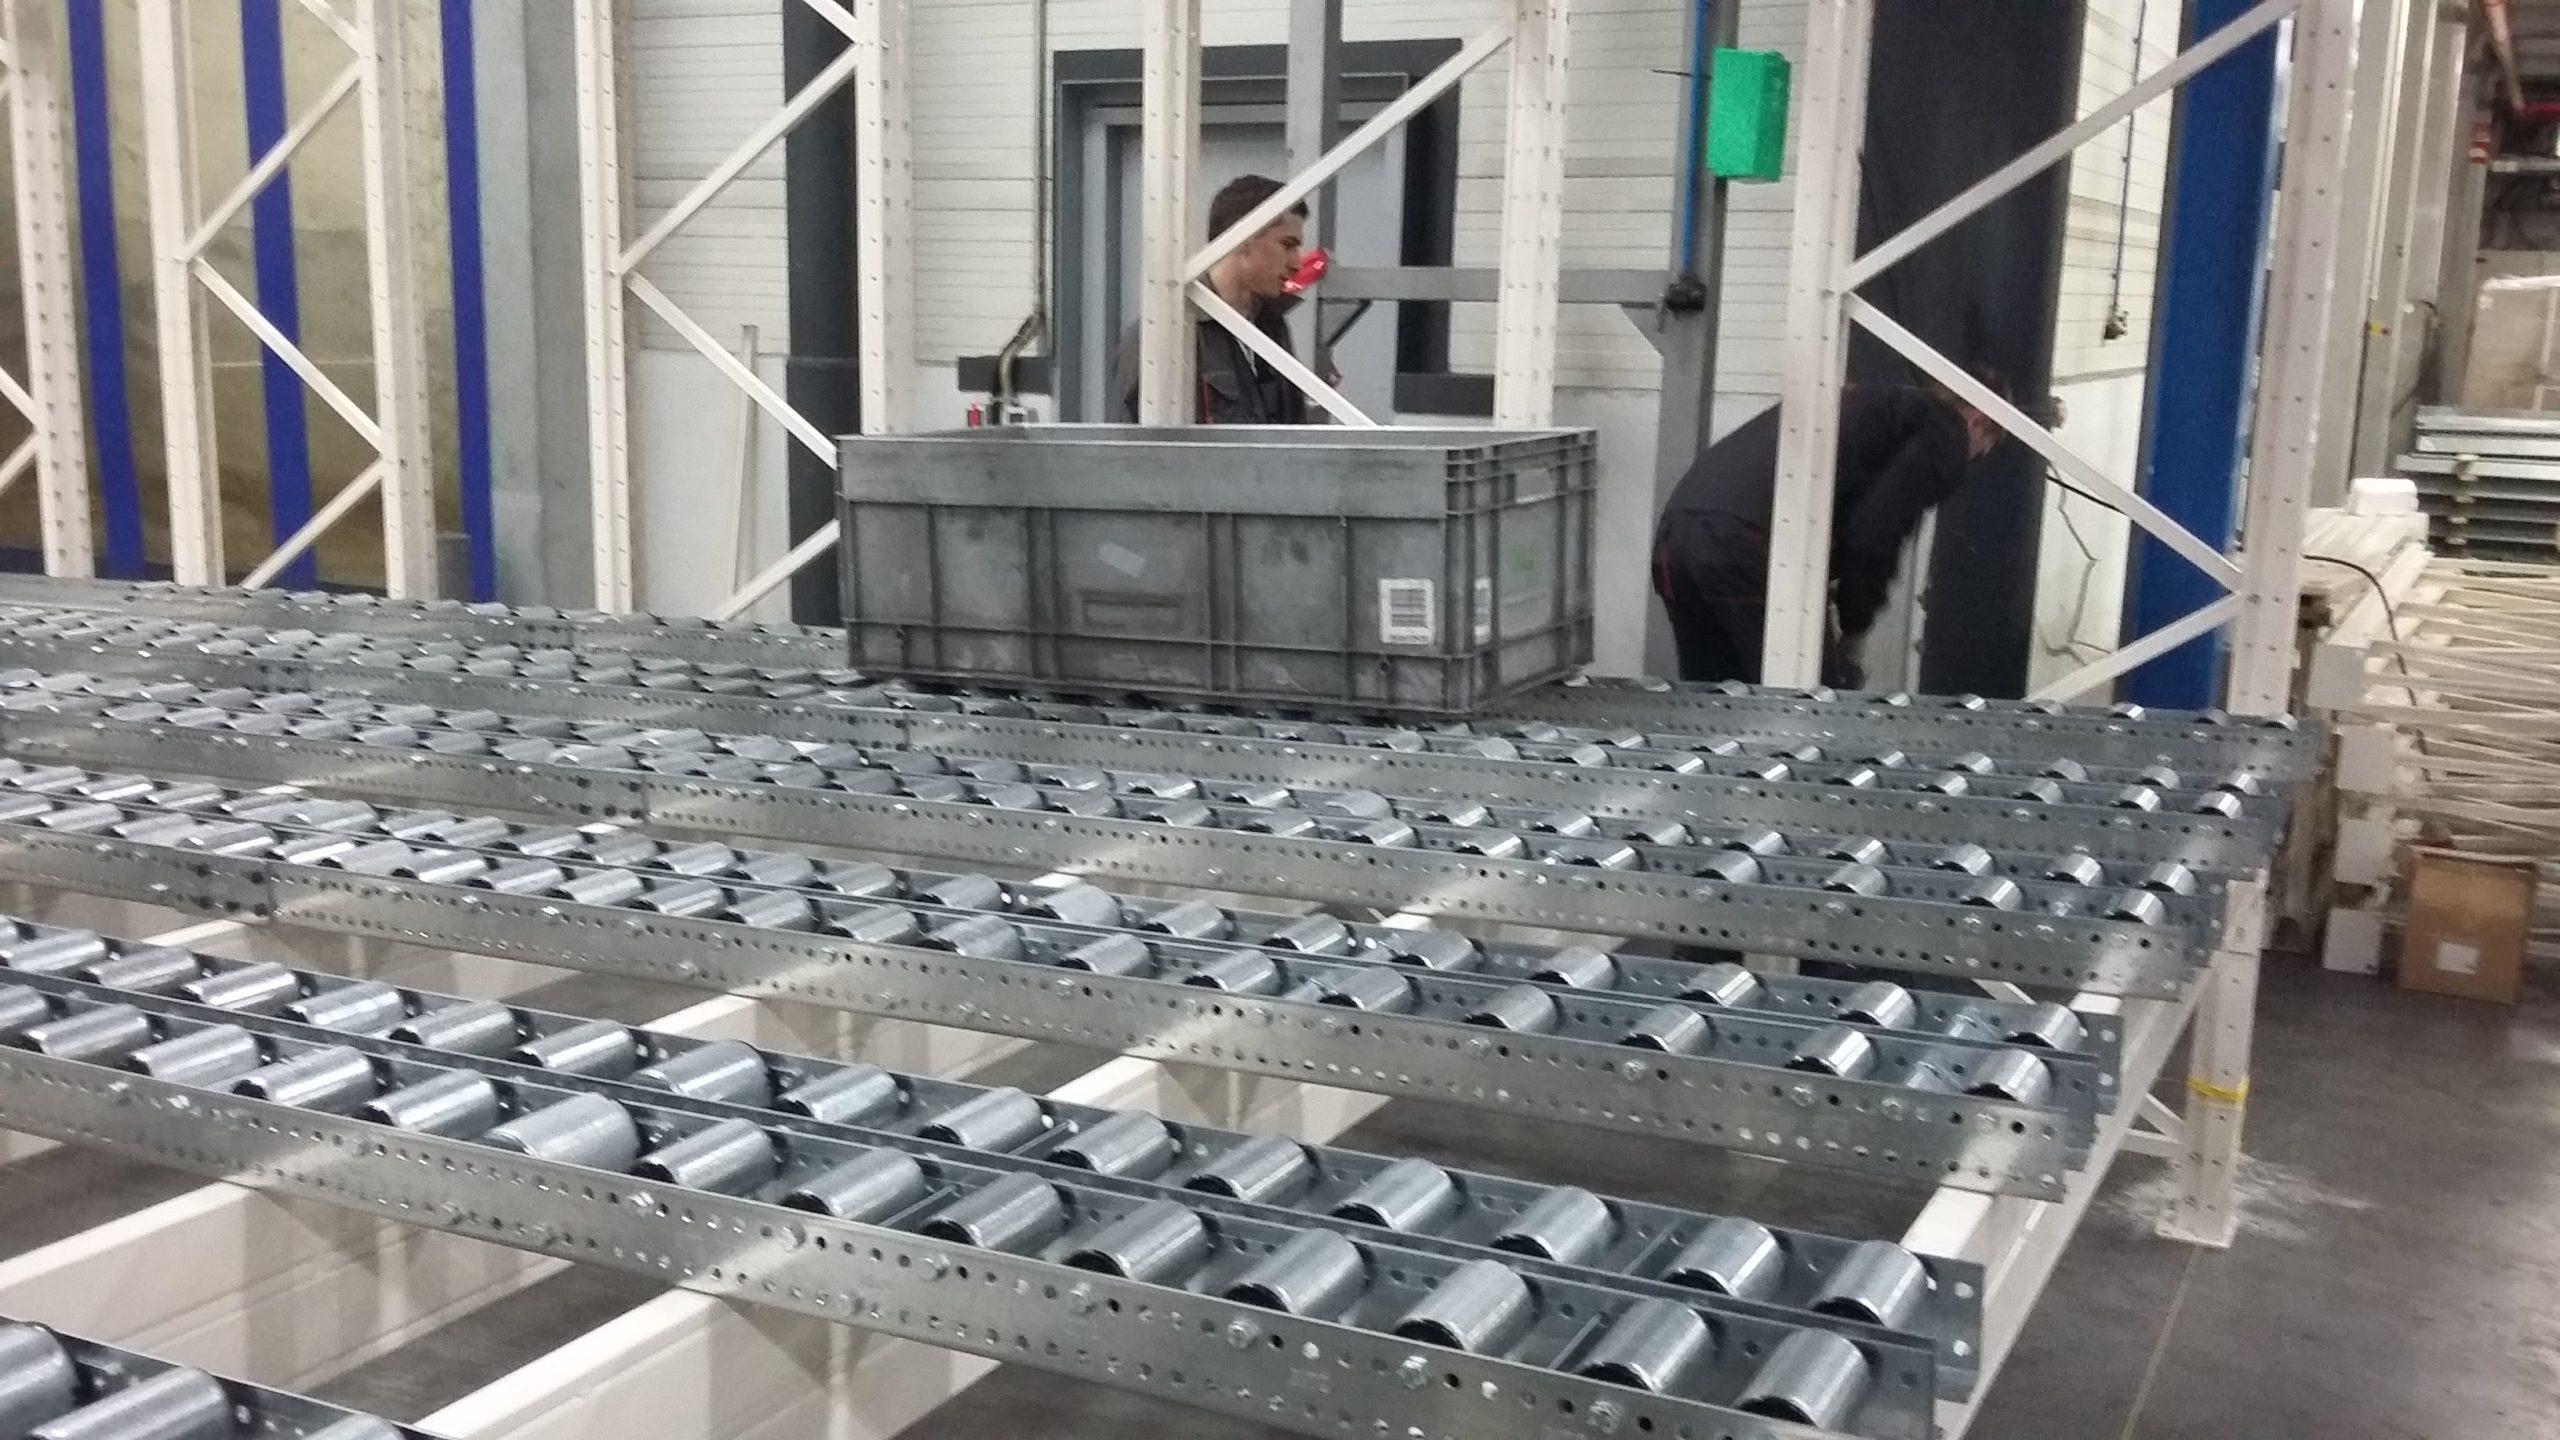 Production warehouse automation for Kromberg&Schubert - 15 - kapelou.com